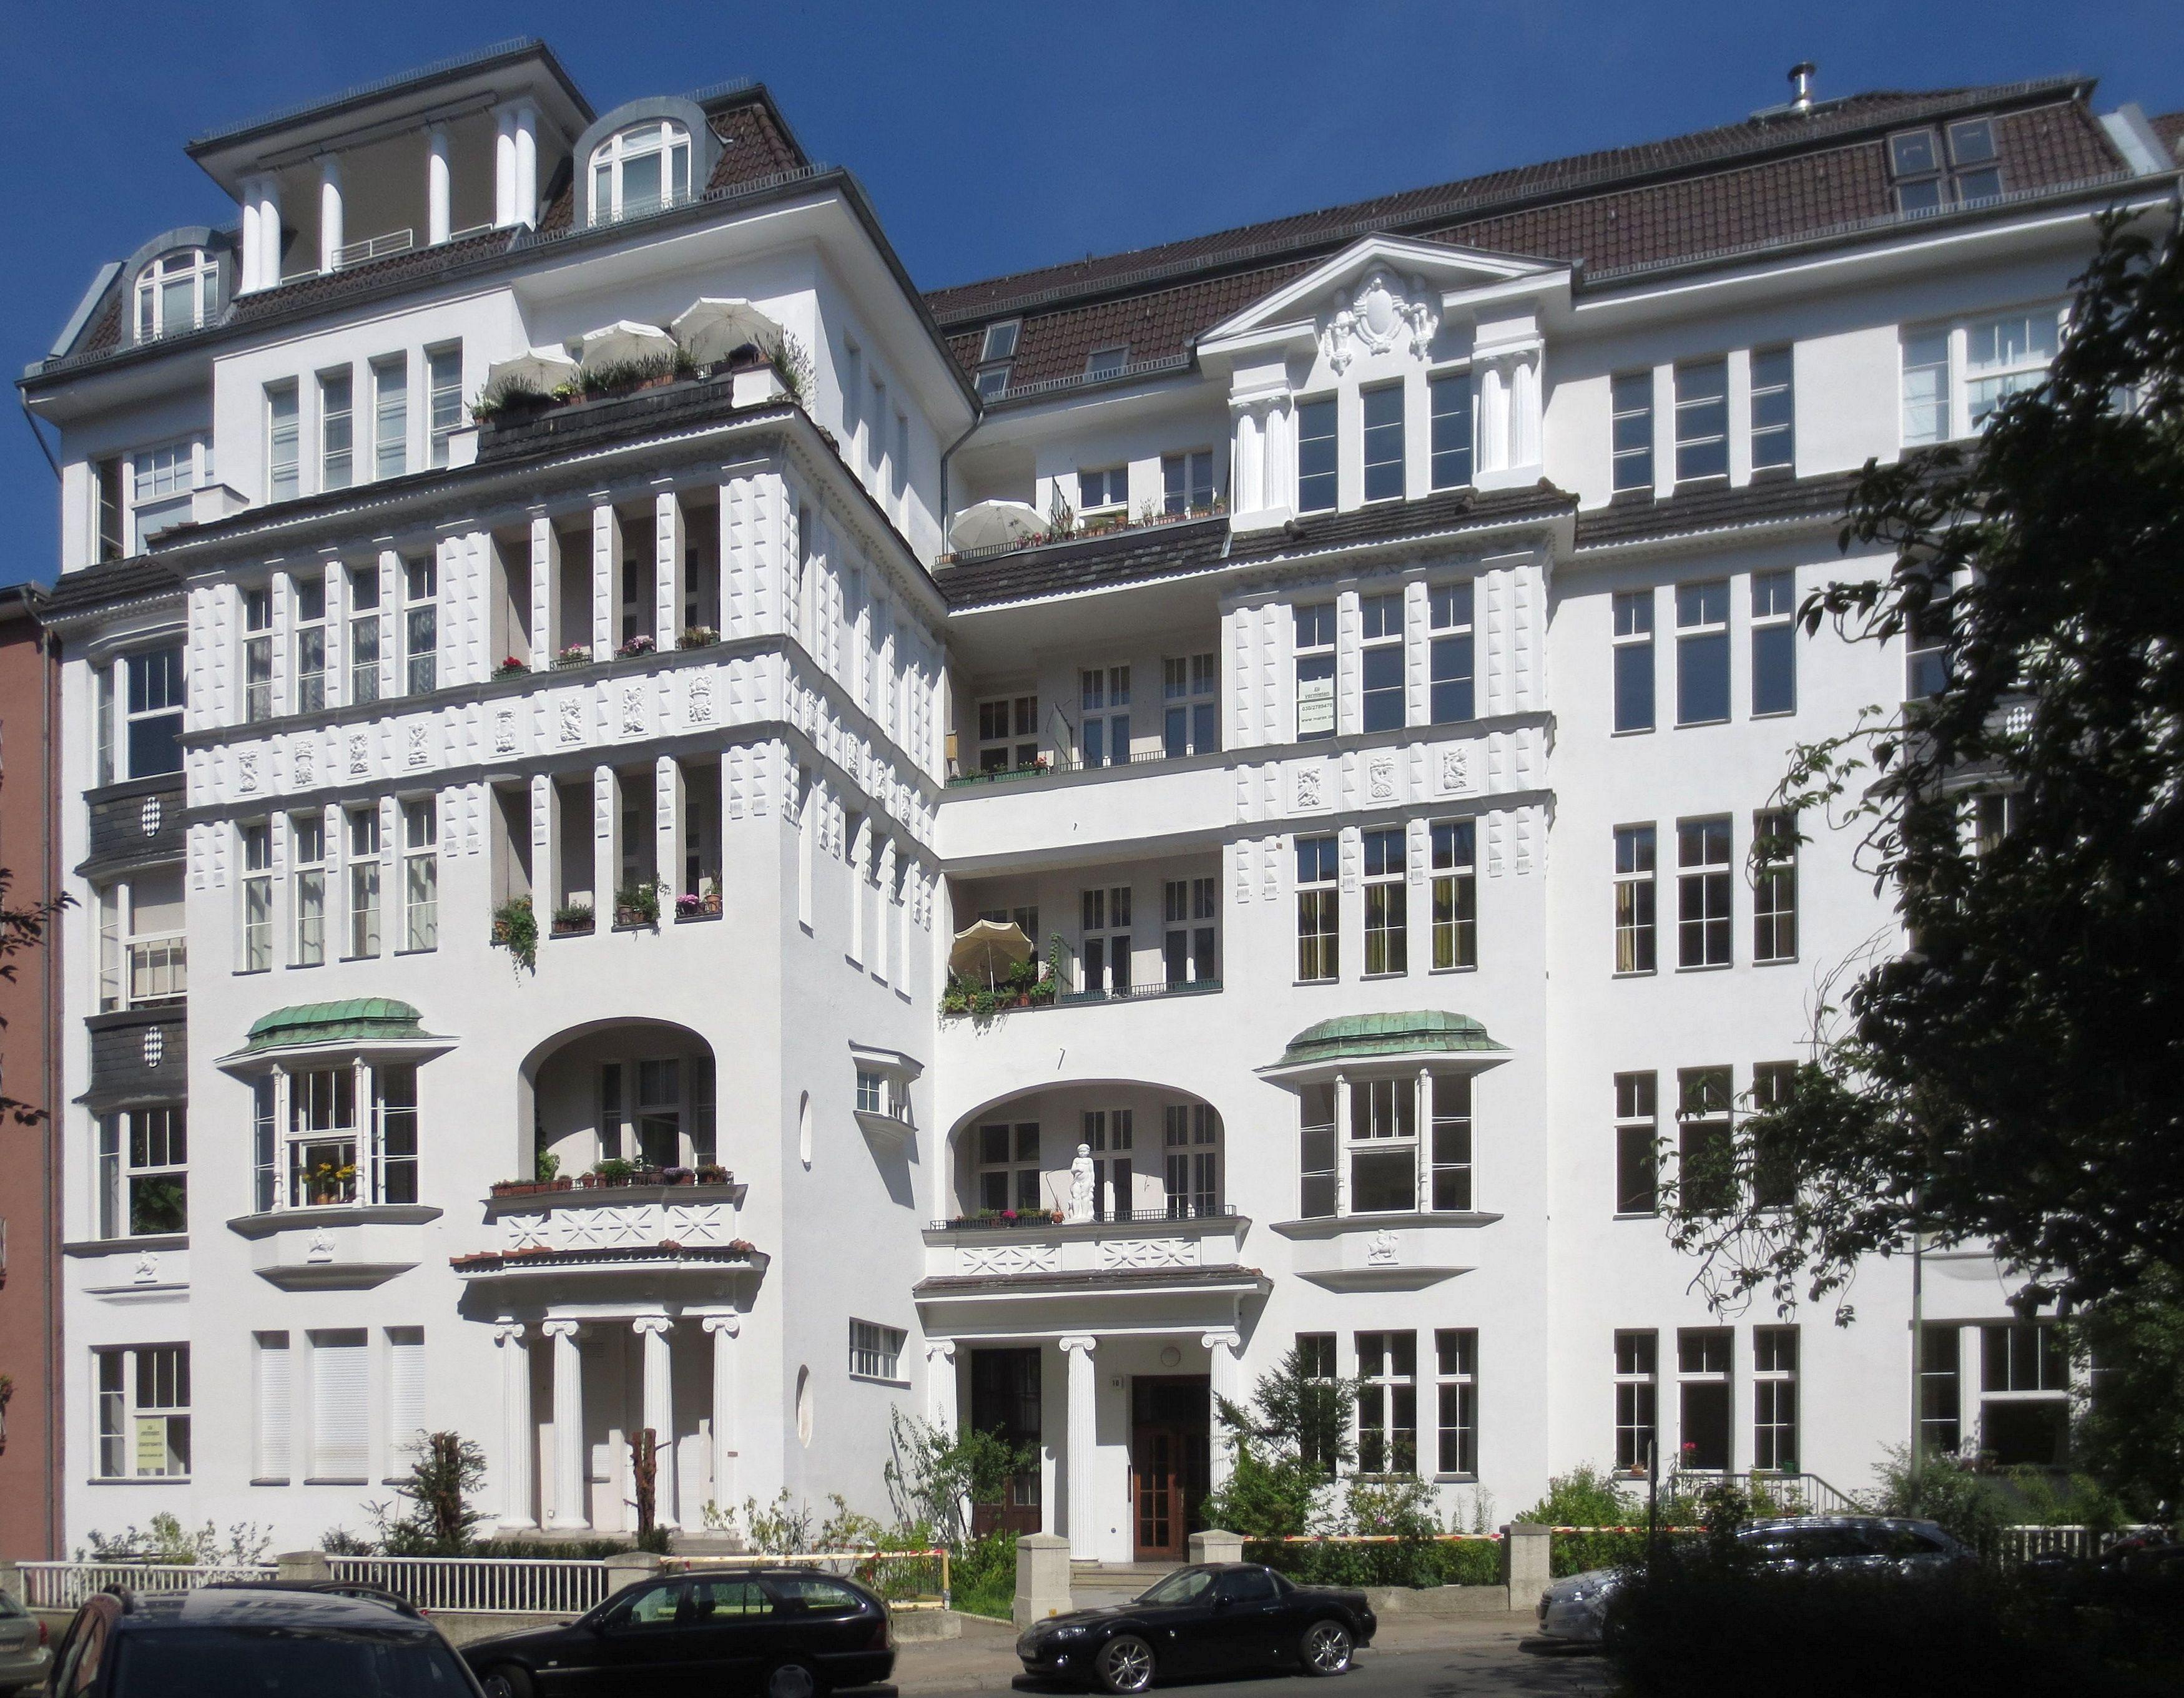 file berlin schoeneberg hewaldstrasse 10 wikimedia commons. Black Bedroom Furniture Sets. Home Design Ideas